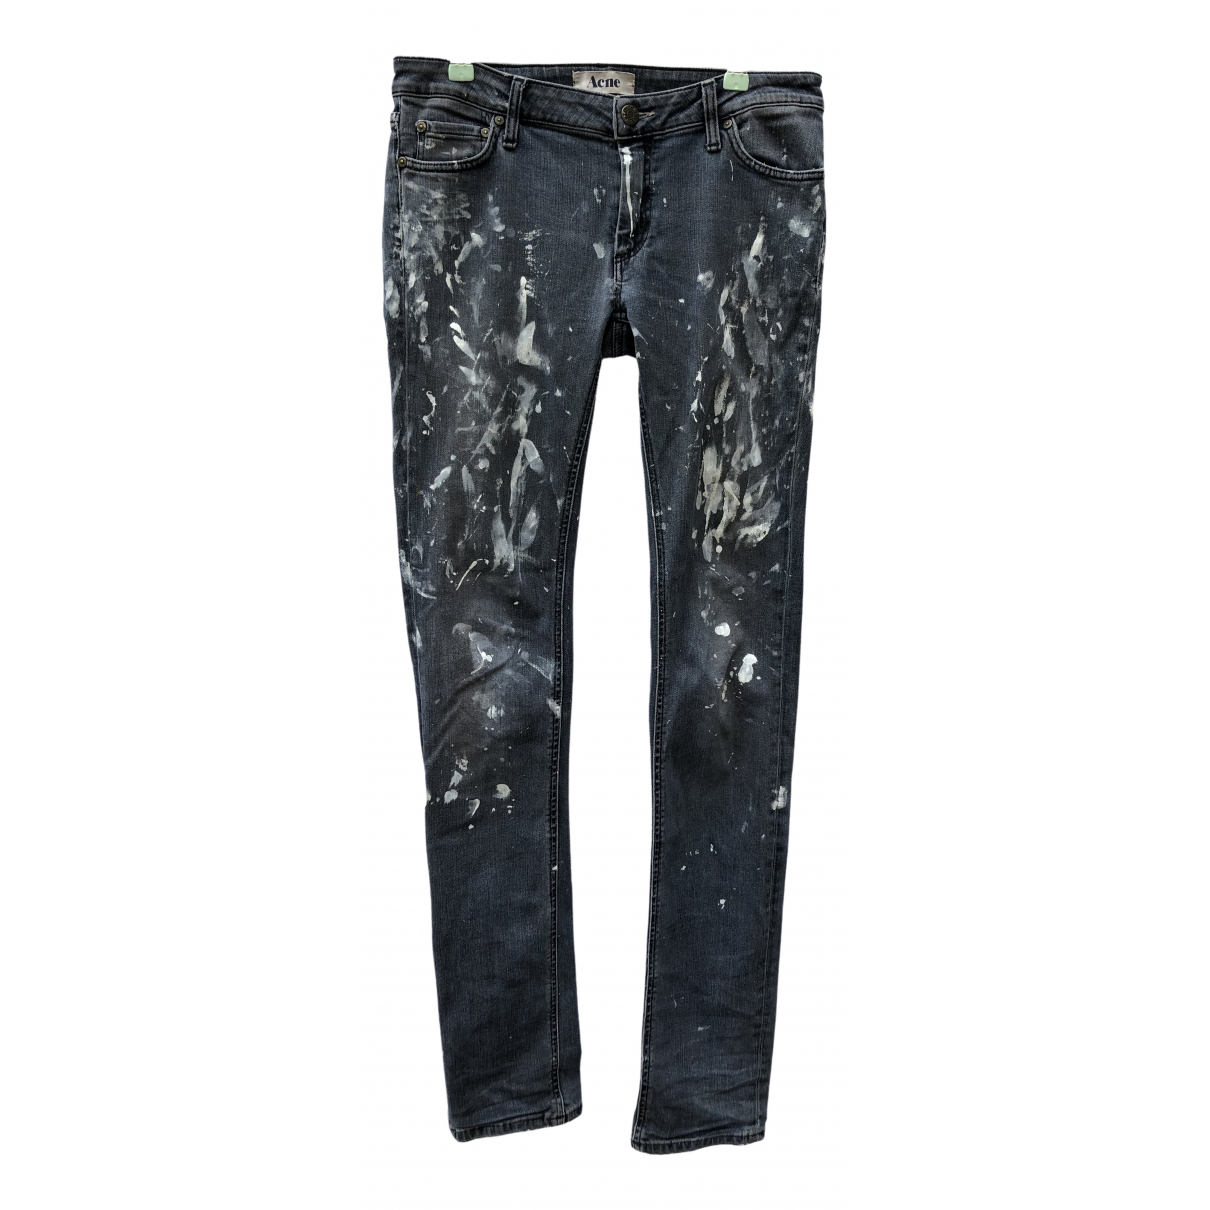 Acne Studios \N Anthracite Cotton - elasthane Jeans for Men 30 US